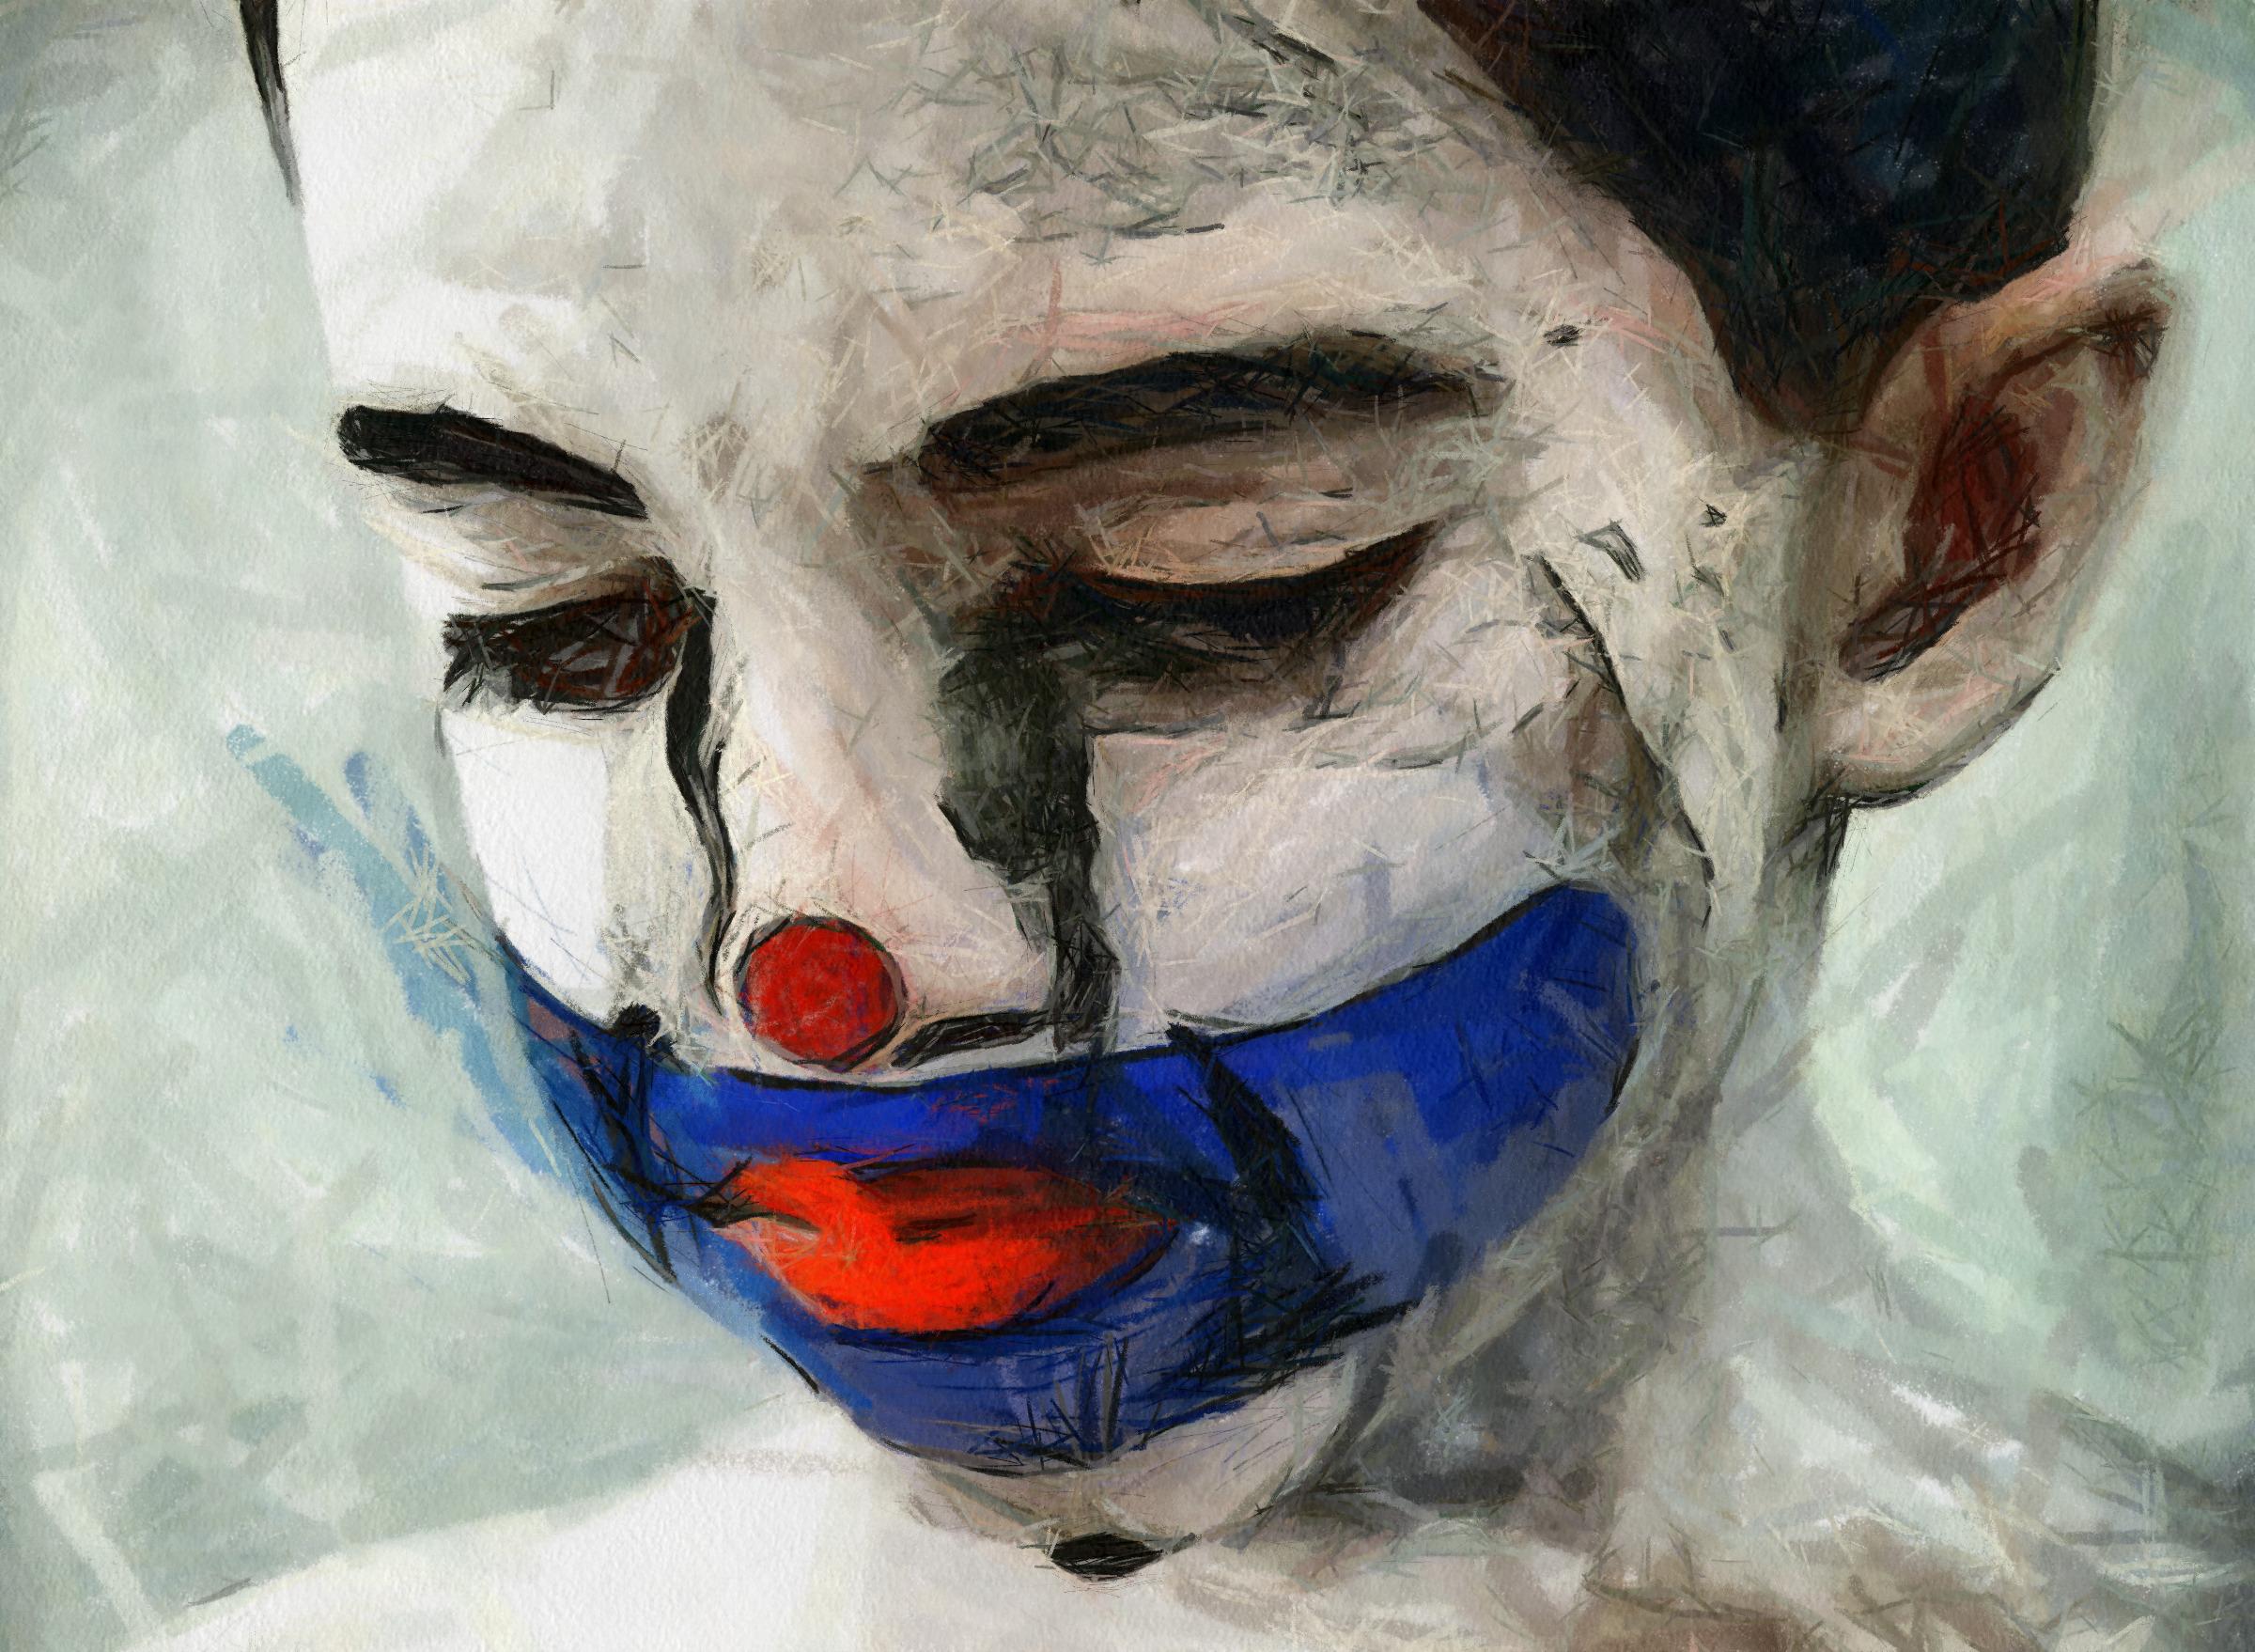 Sad Clown Boy by Jessica-Art on DeviantArt